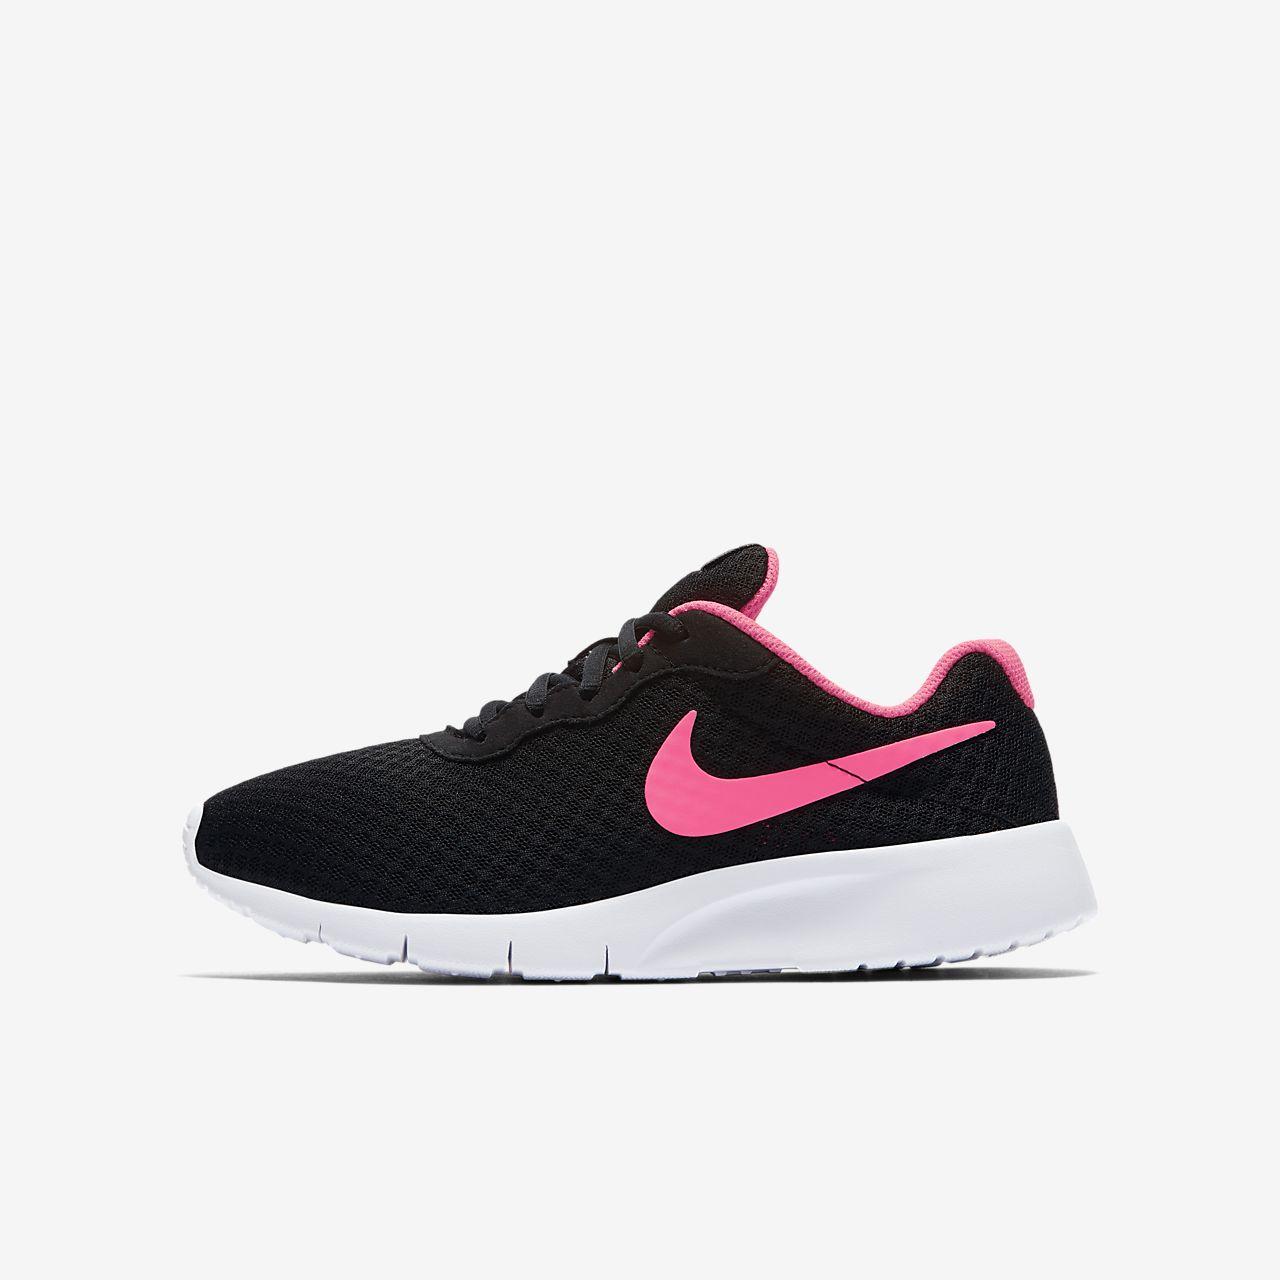 Calzado para niños talla grande Nike Tanjun